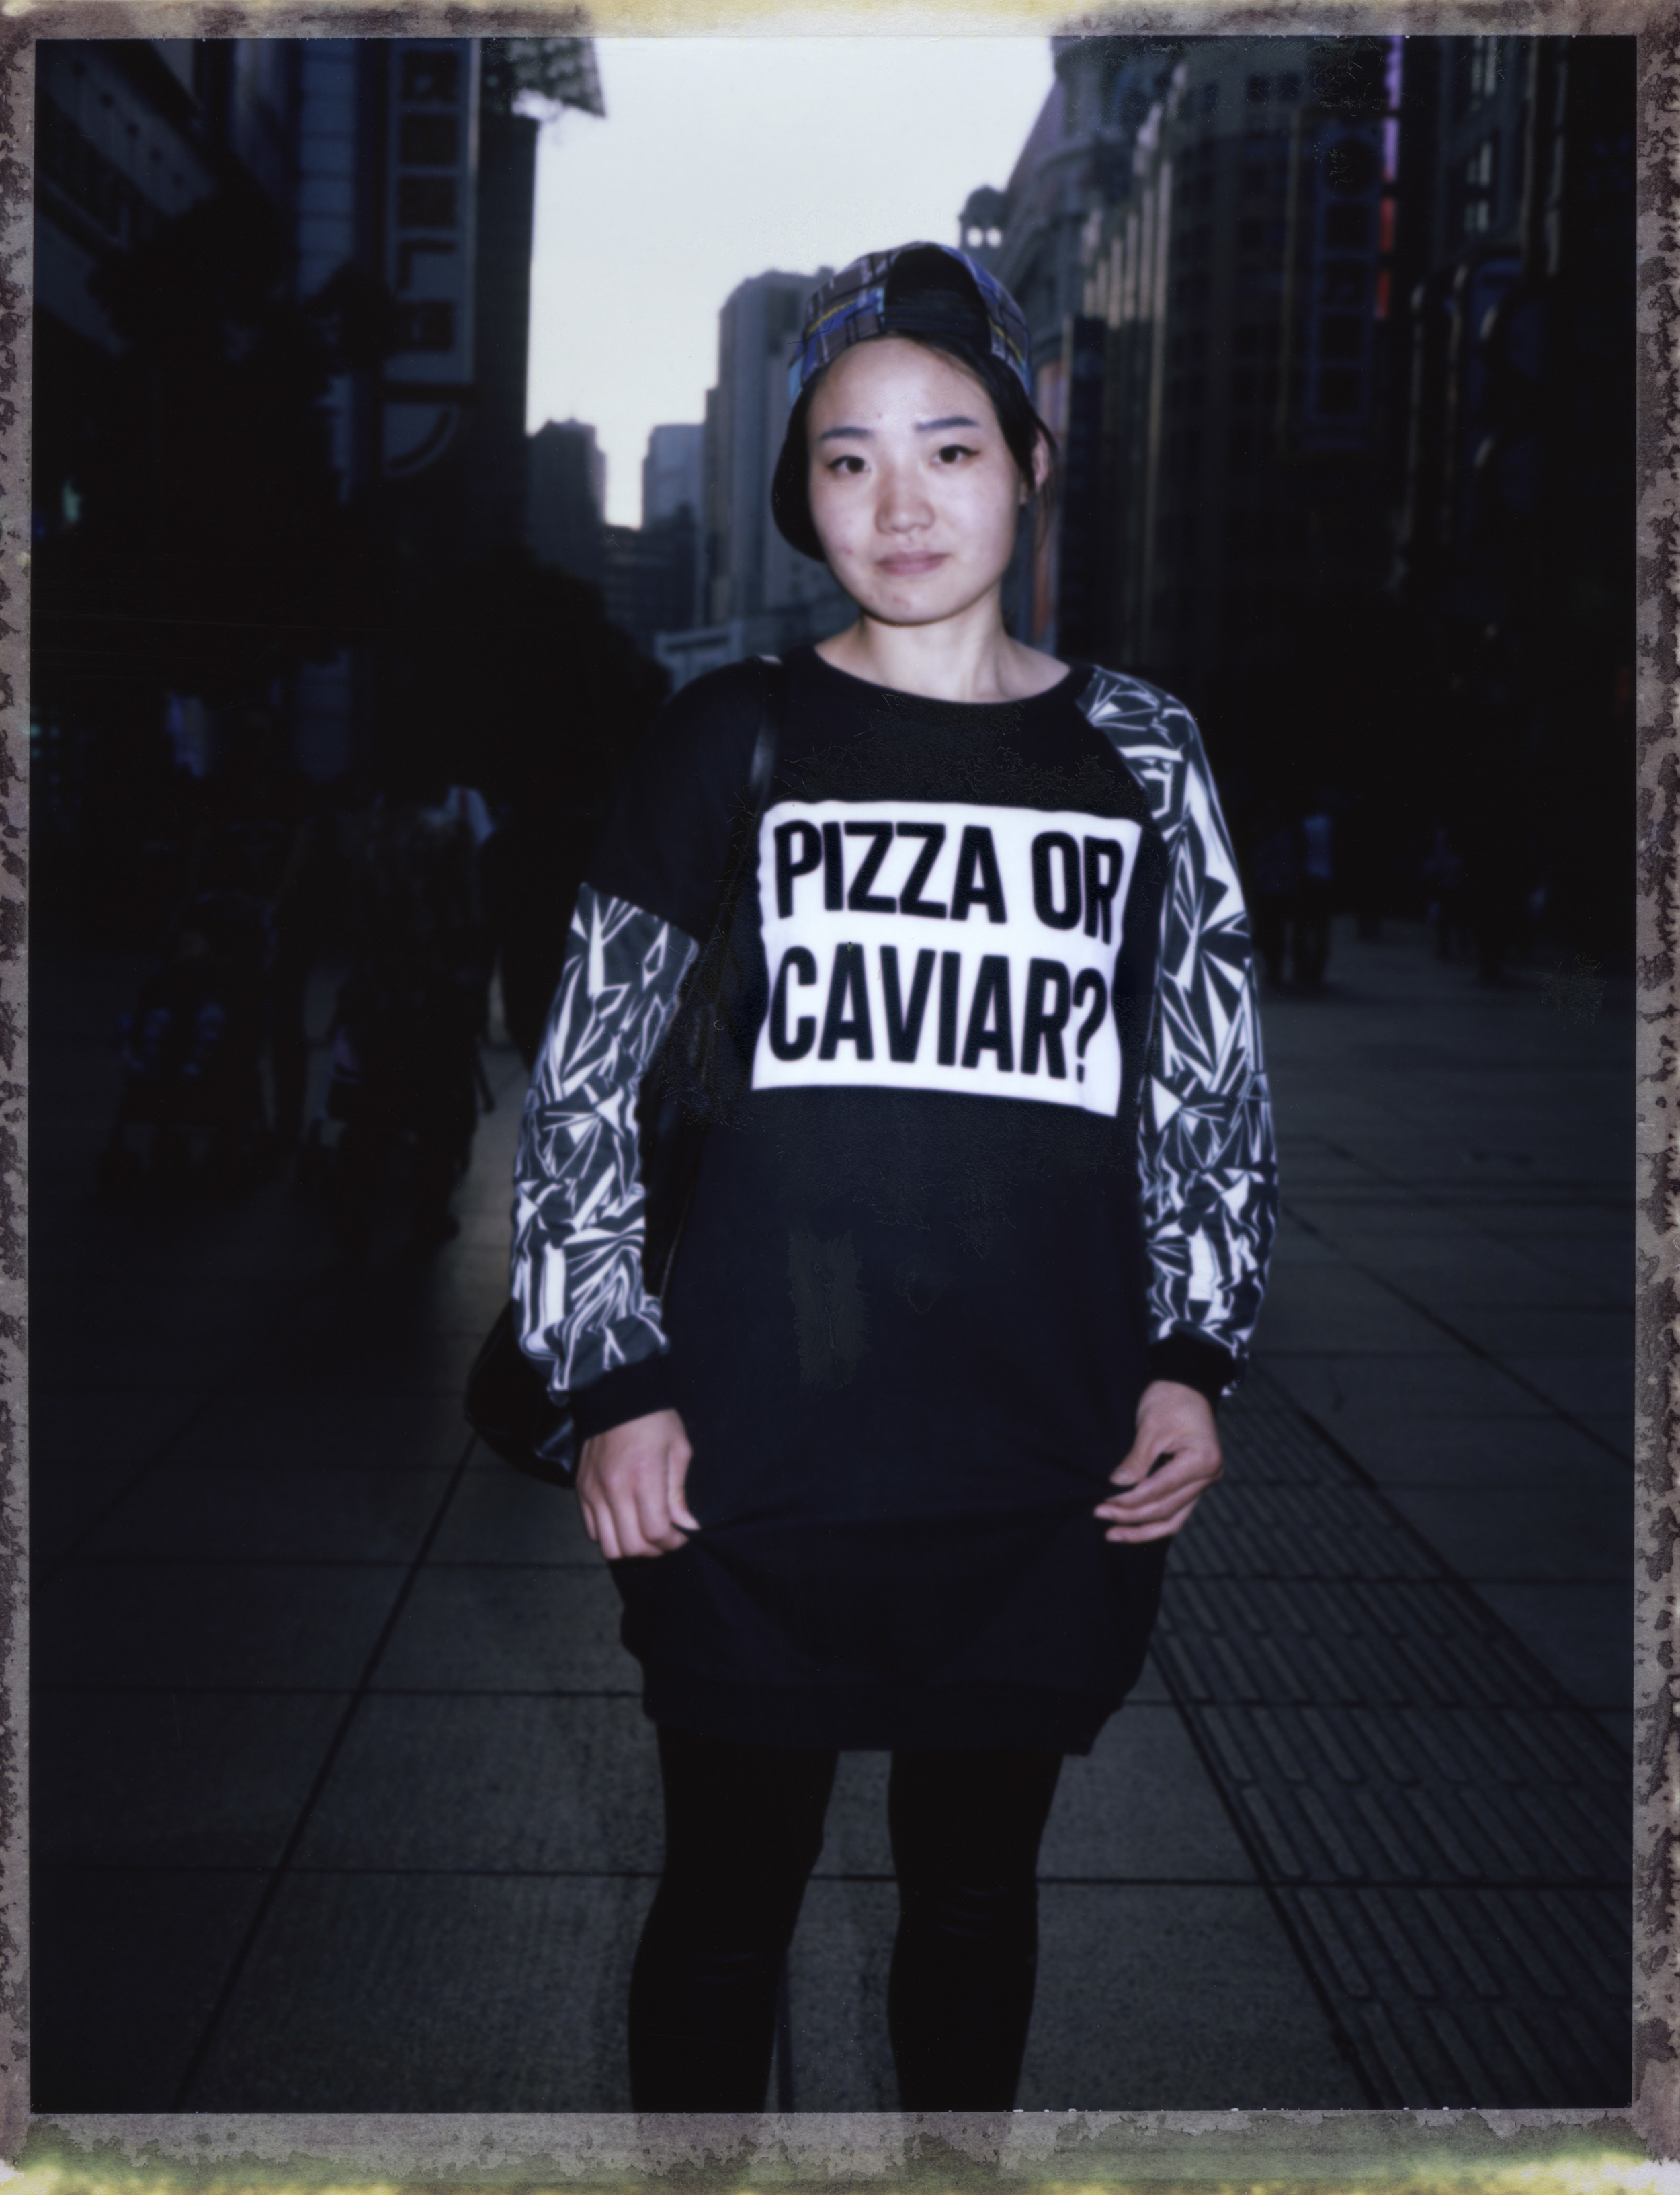 Pizza or Caviar.jpg